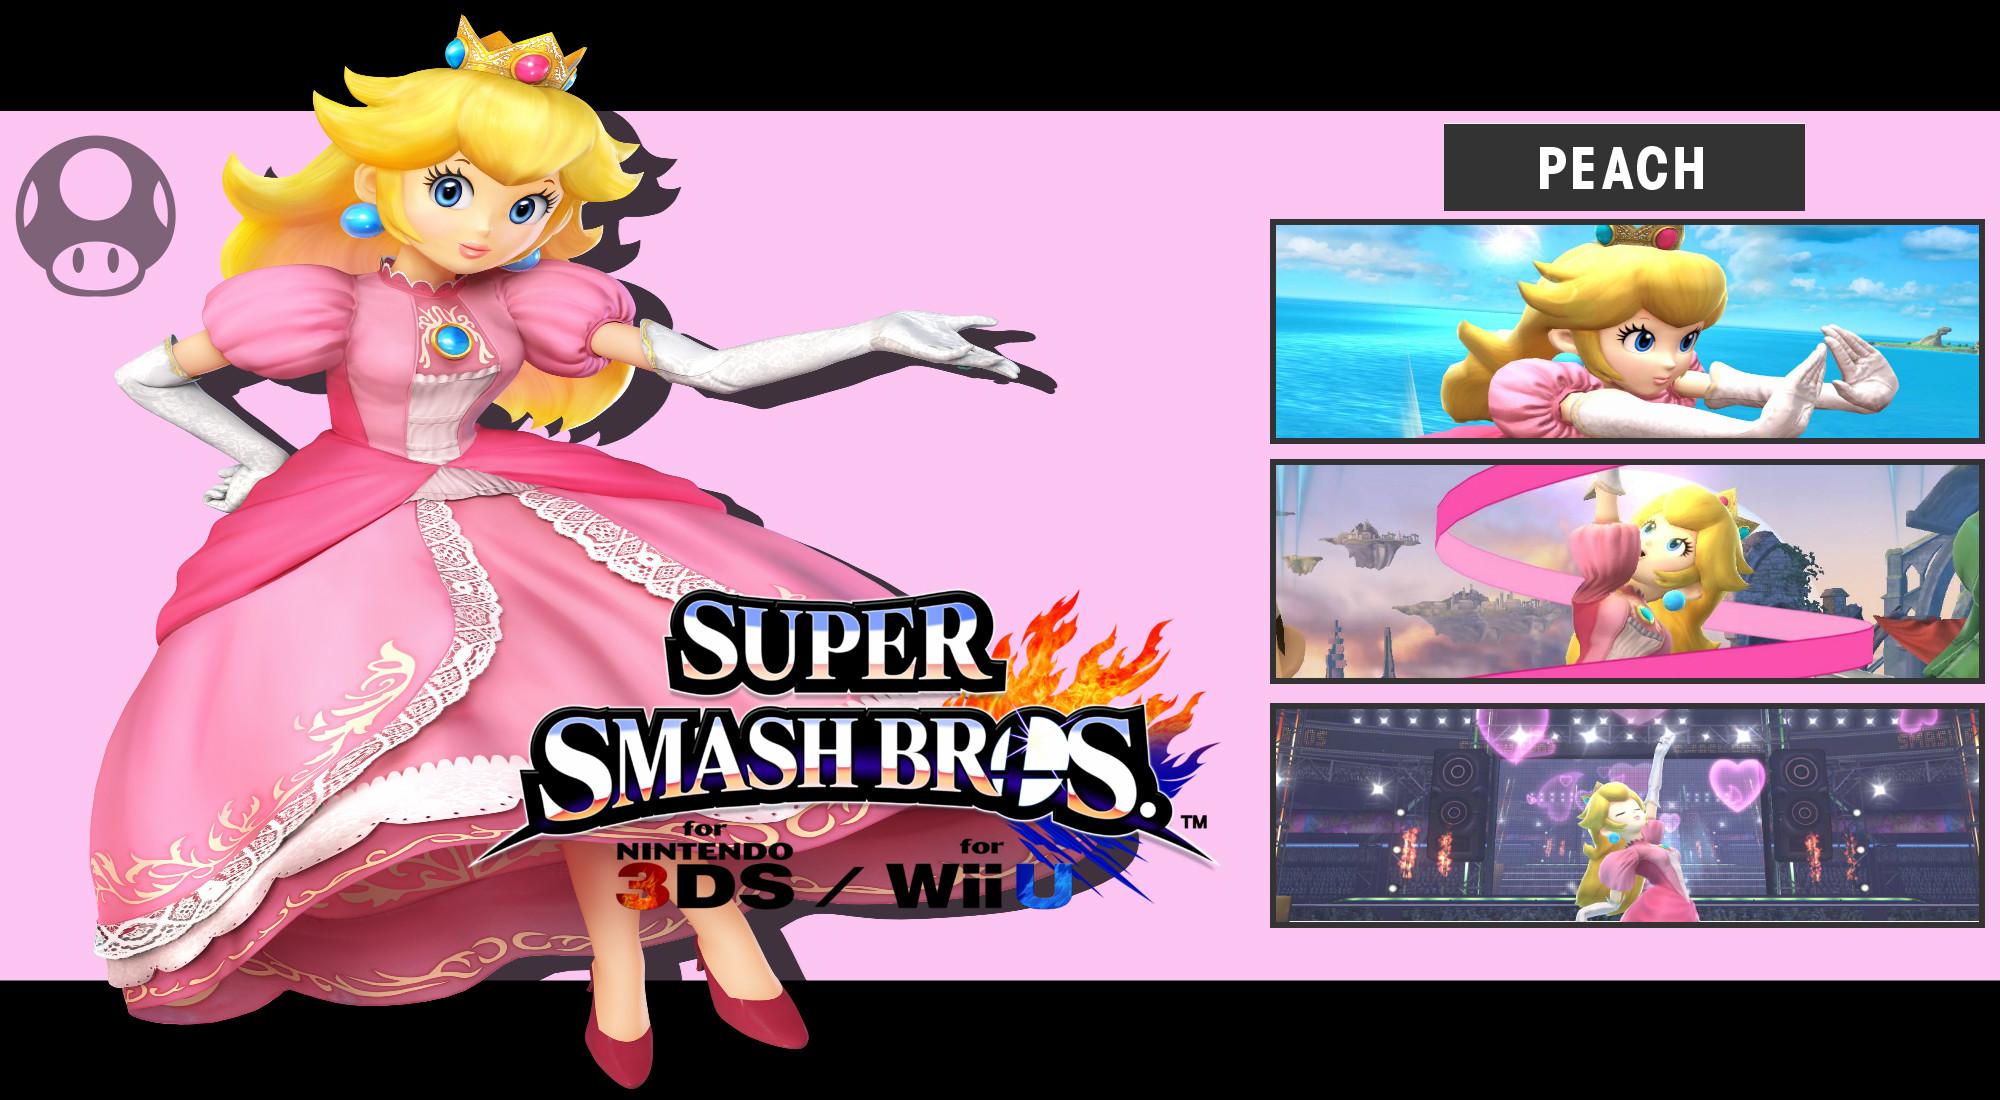 … DaKidGaming Super Smash Bros. 3DS/Wii U – Peach Wallpaper by DaKidGaming